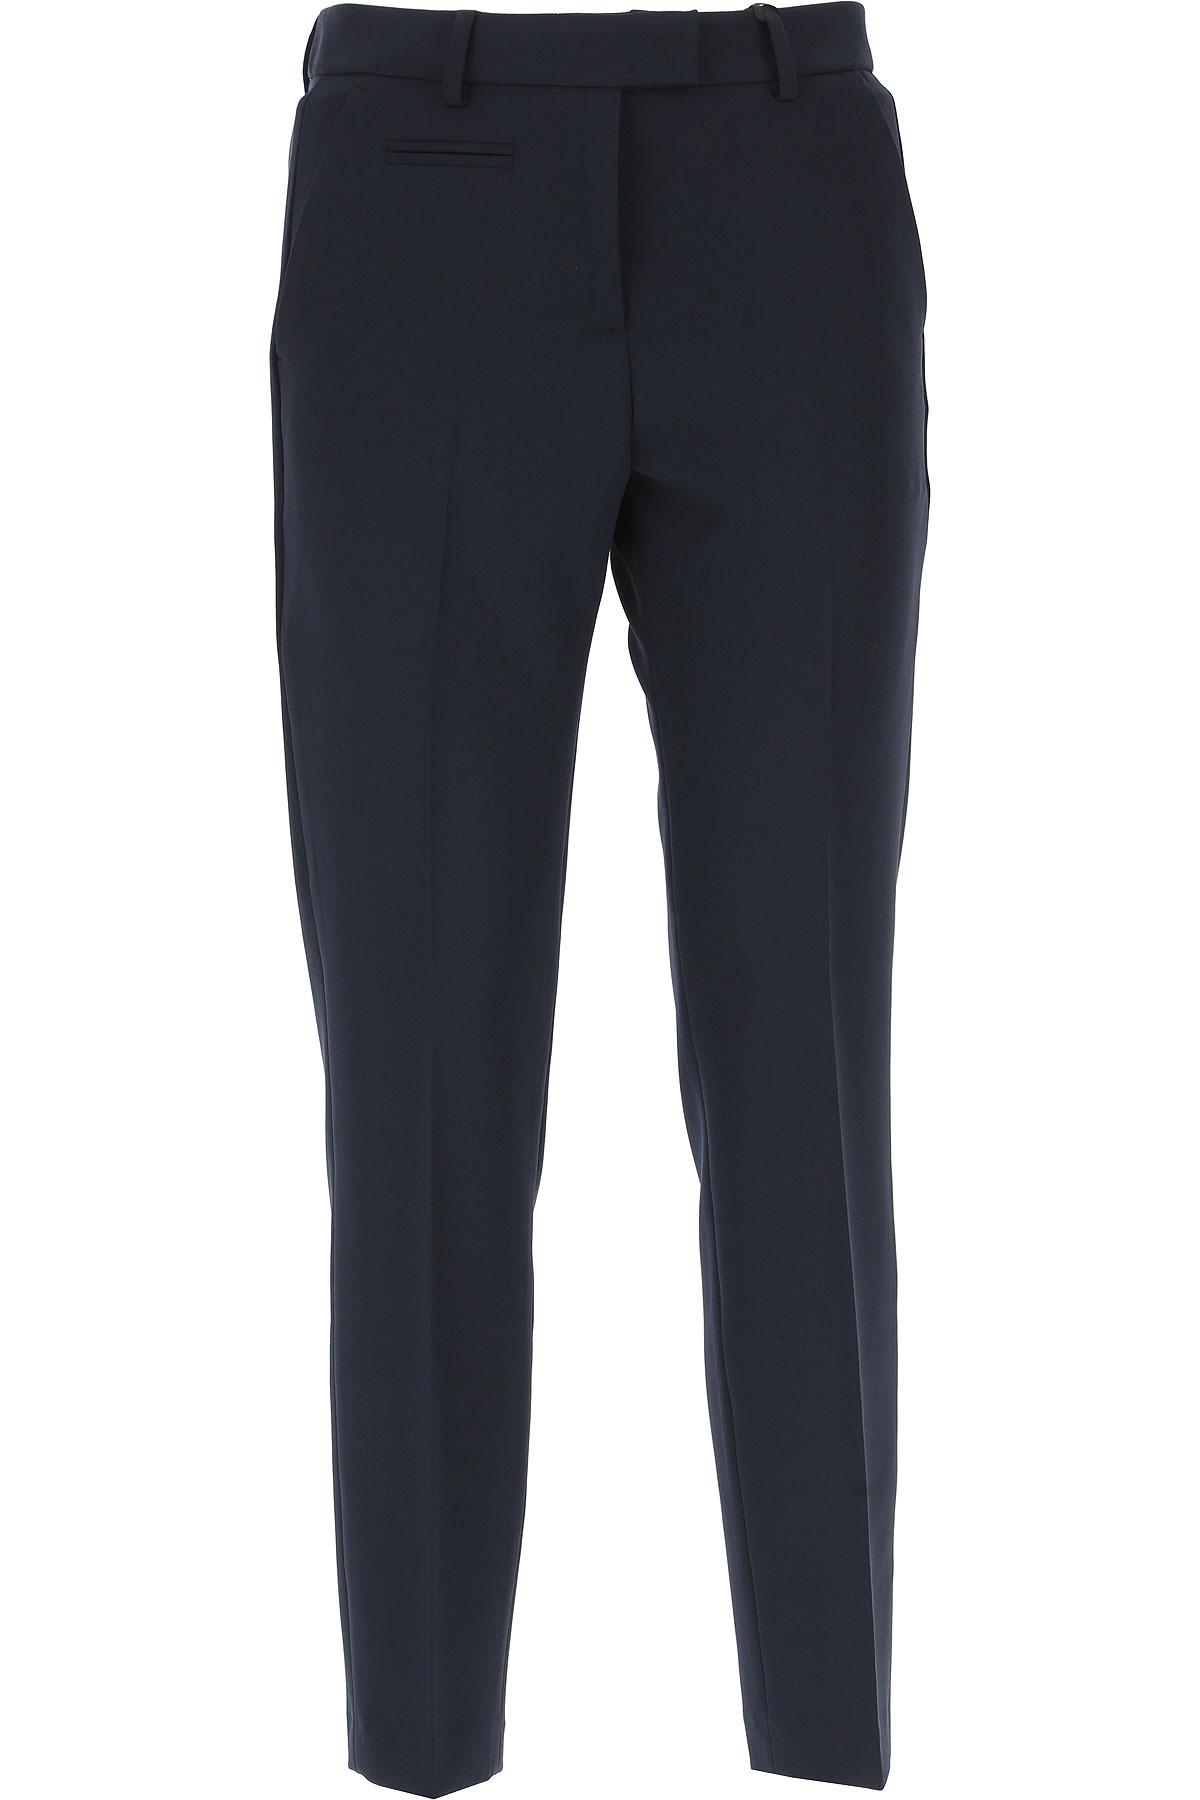 Image of Blugirl Pants for Women, Black, Viscose, 2017, 26 28 30